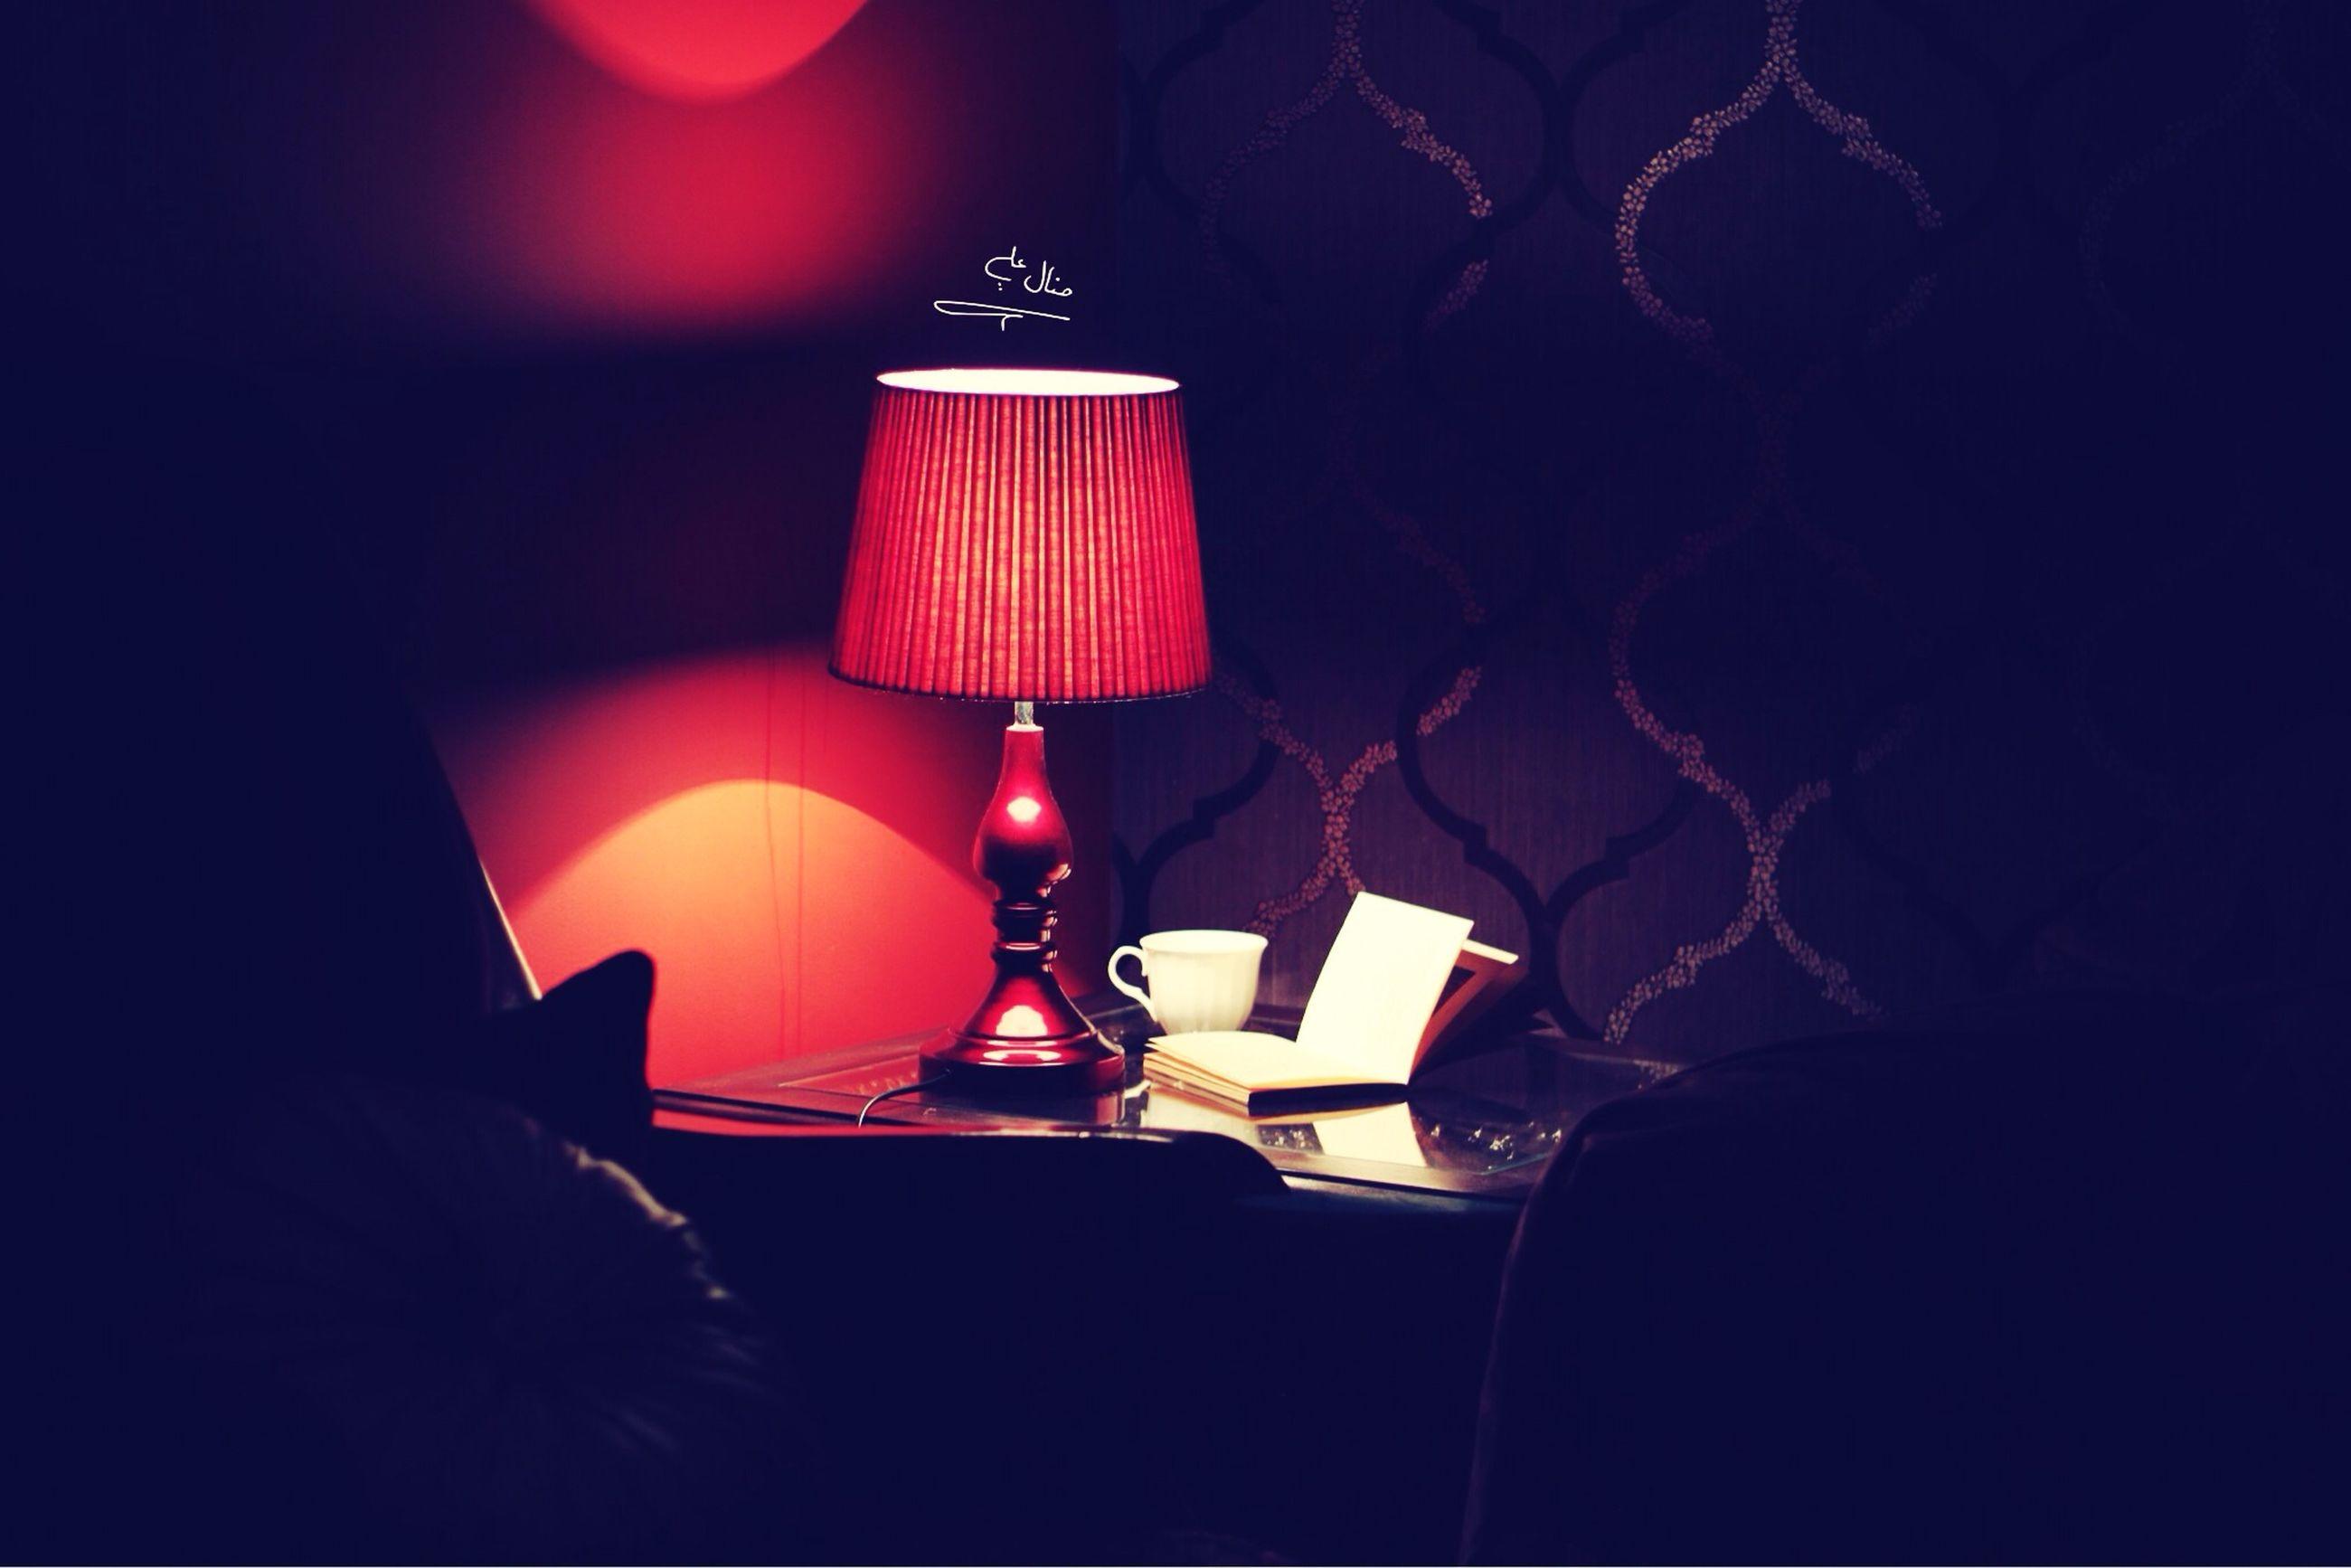 illuminated, indoors, lighting equipment, night, dark, candle, hanging, red, glowing, lantern, lit, decoration, light - natural phenomenon, electricity, lamp, light, electric lamp, celebration, darkroom, close-up